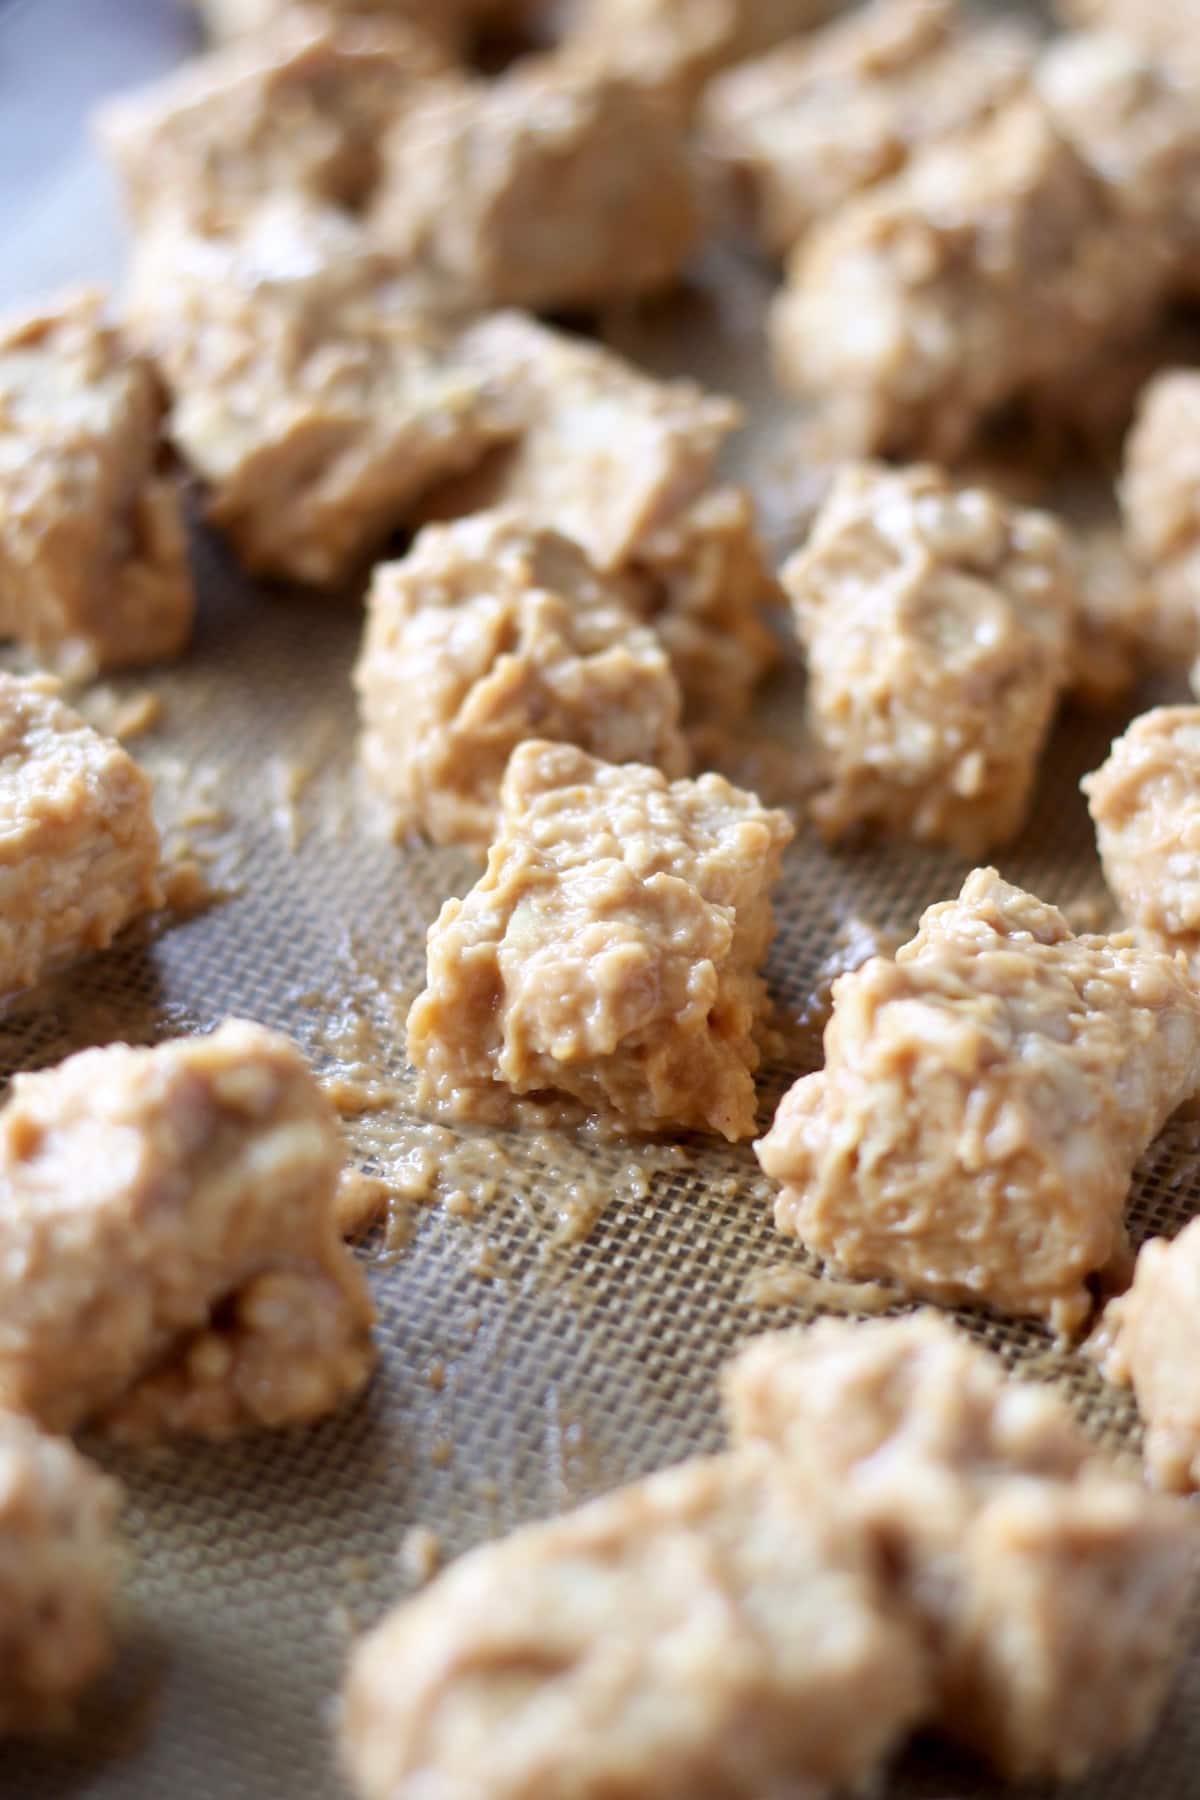 peanut orange sauce coated tempeh bites arranged on a baking tray